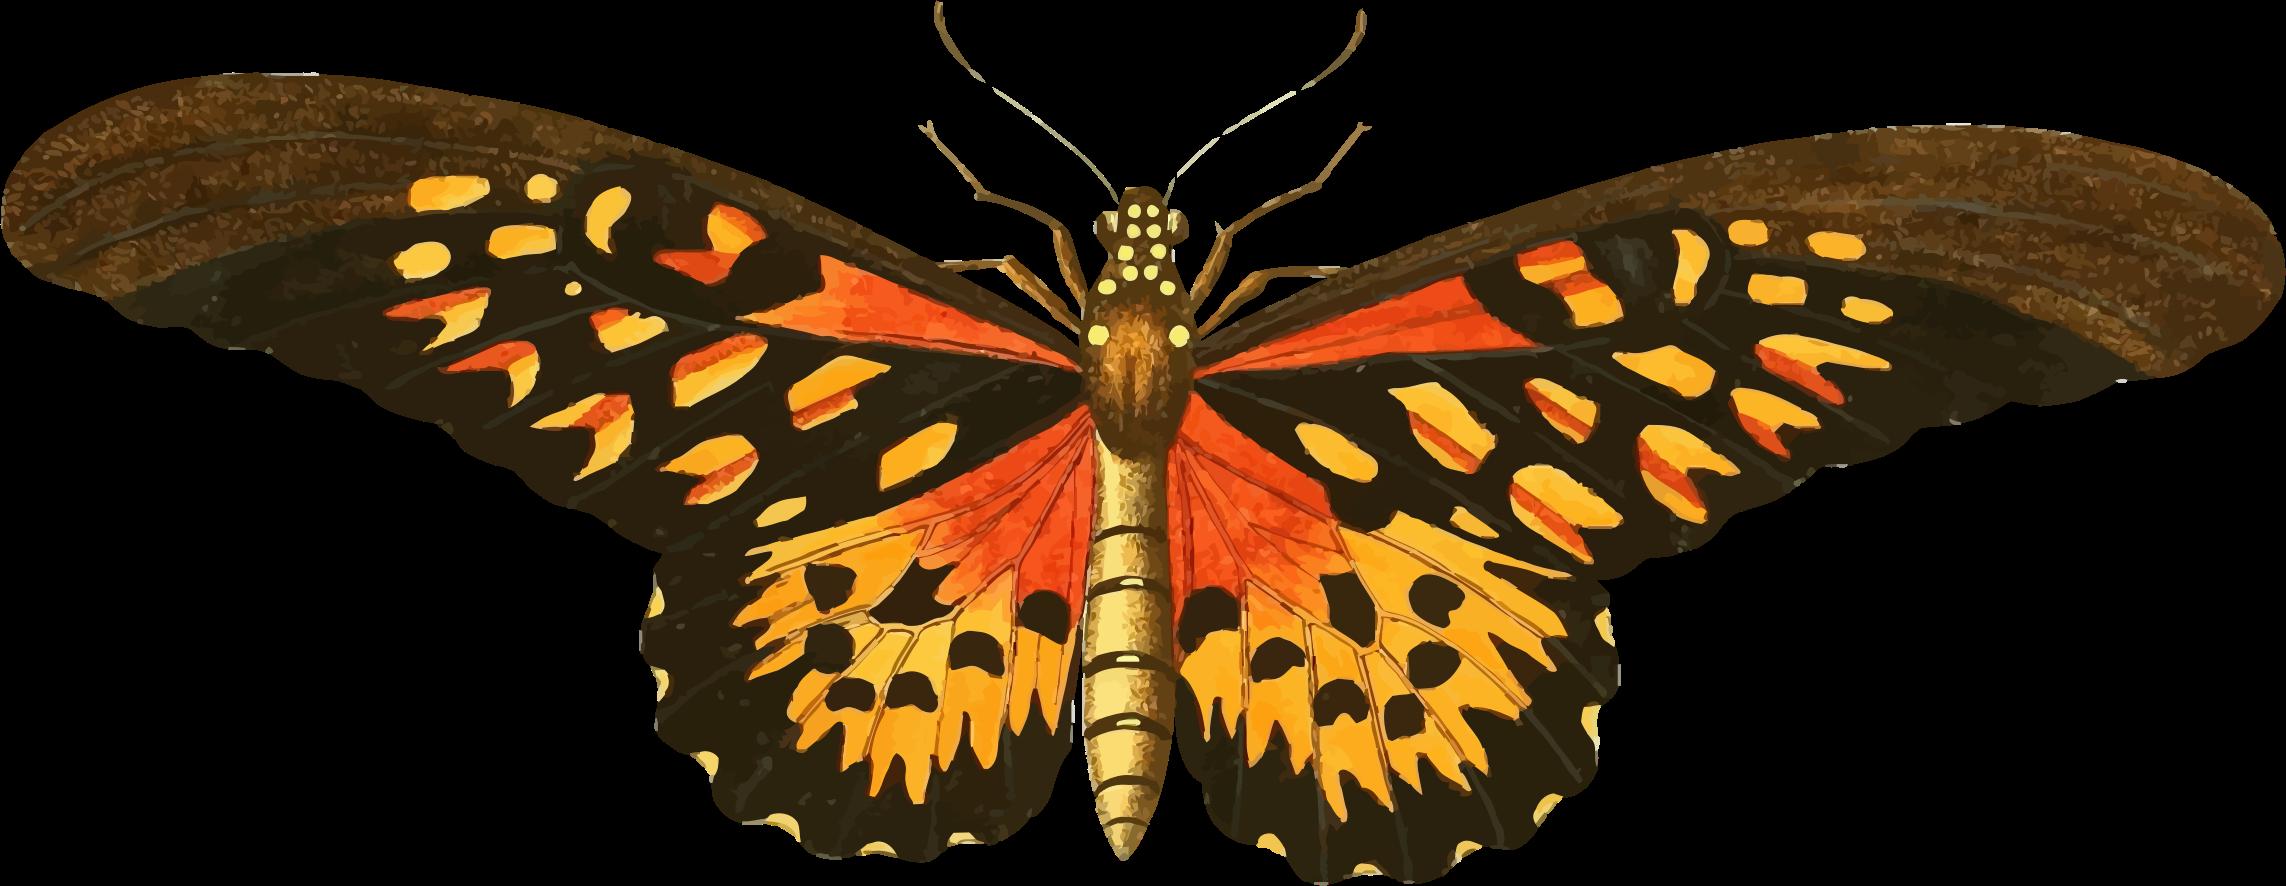 banner royalty free stock Moth clipart vintage butterfly. Illustration pinterest.